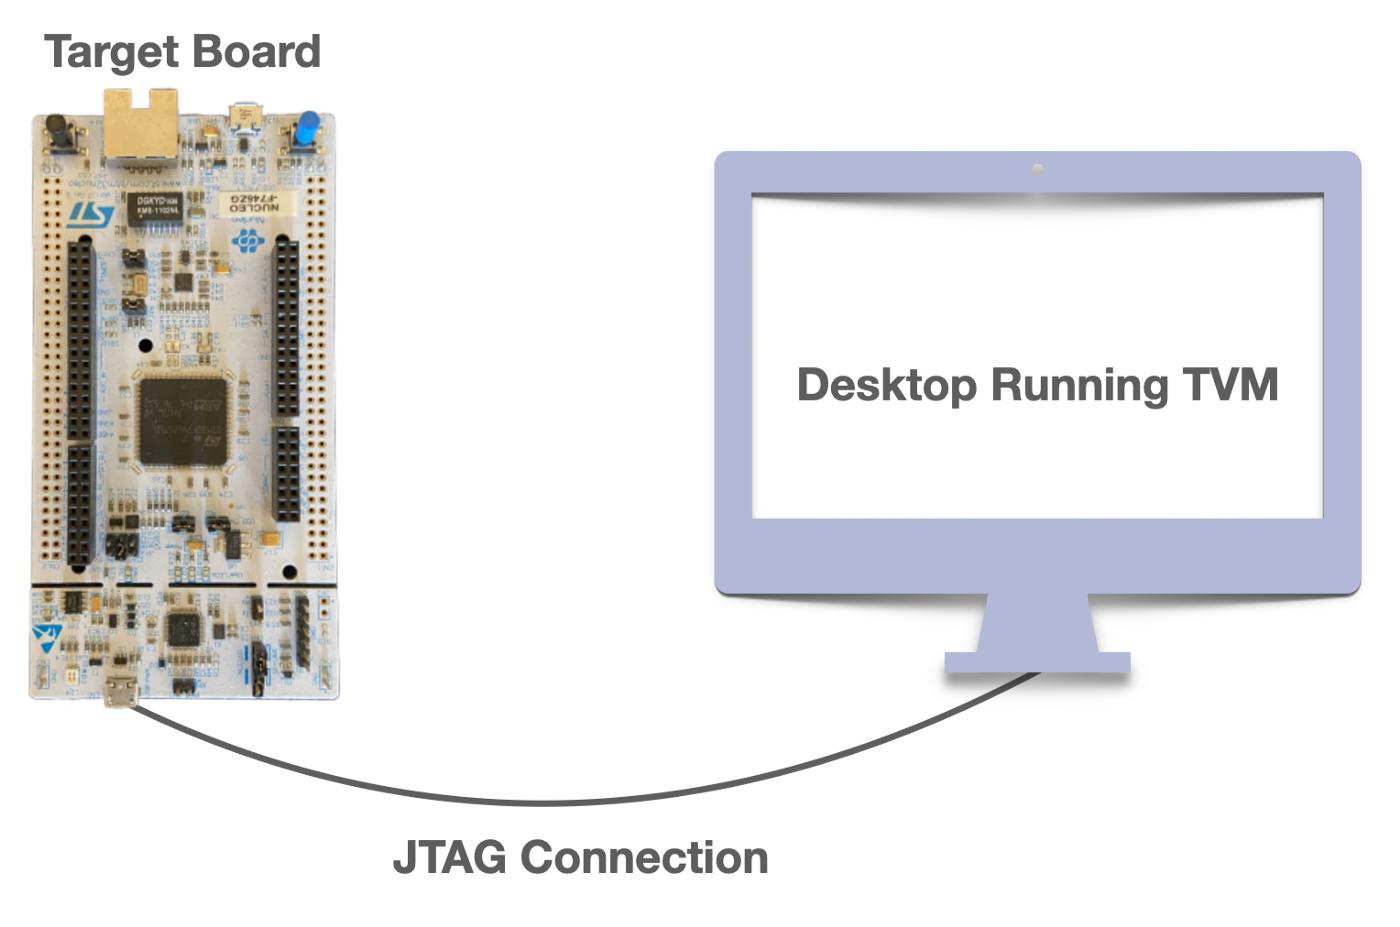 A standard µTVM setup, where the host communicates with the device via JTAG